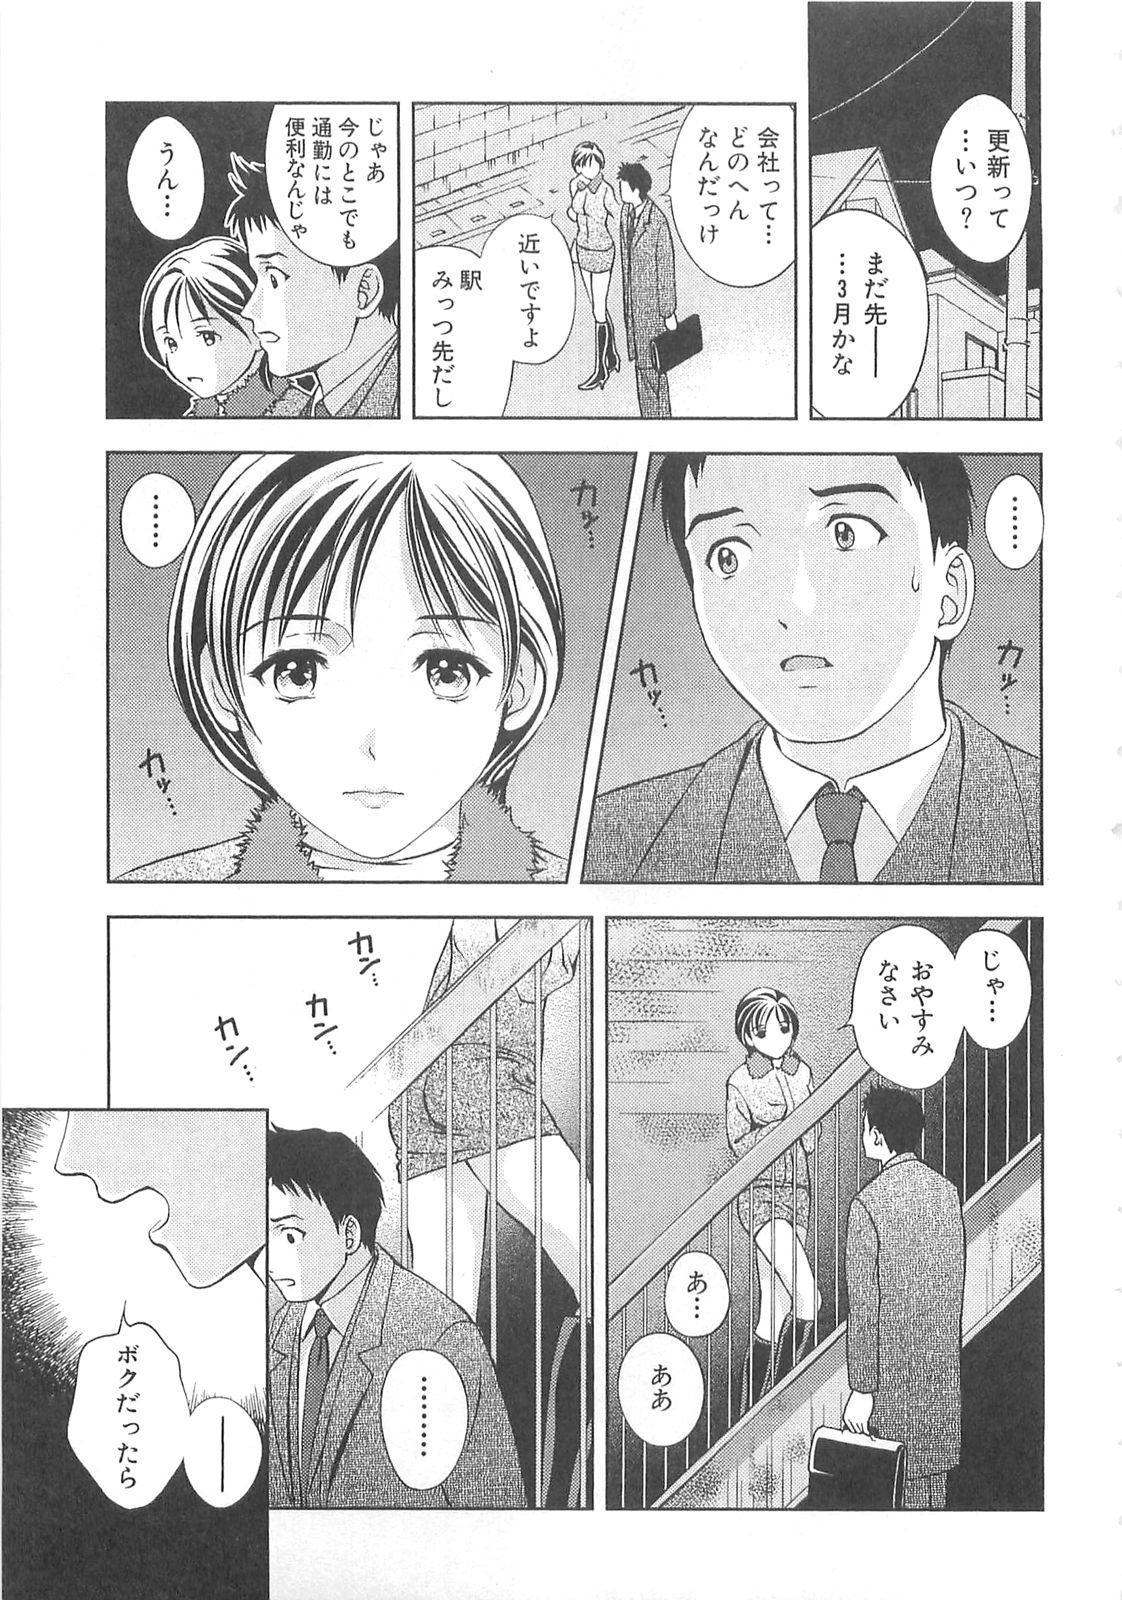 Tenshi no Kyuu - Angel's Pretty Hip 35